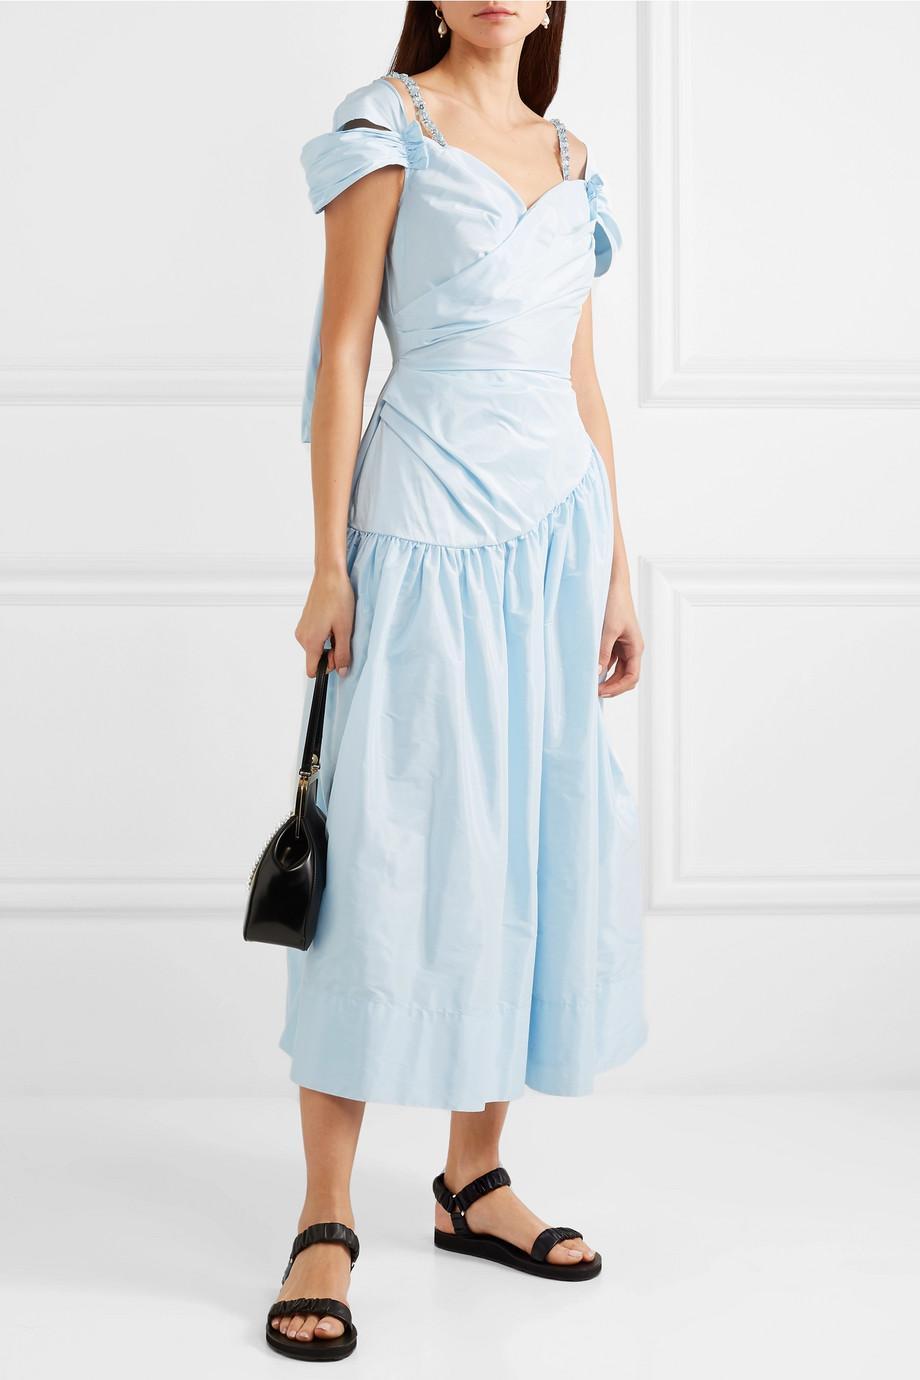 Simone Rocha Embellished ruched taffeta dress